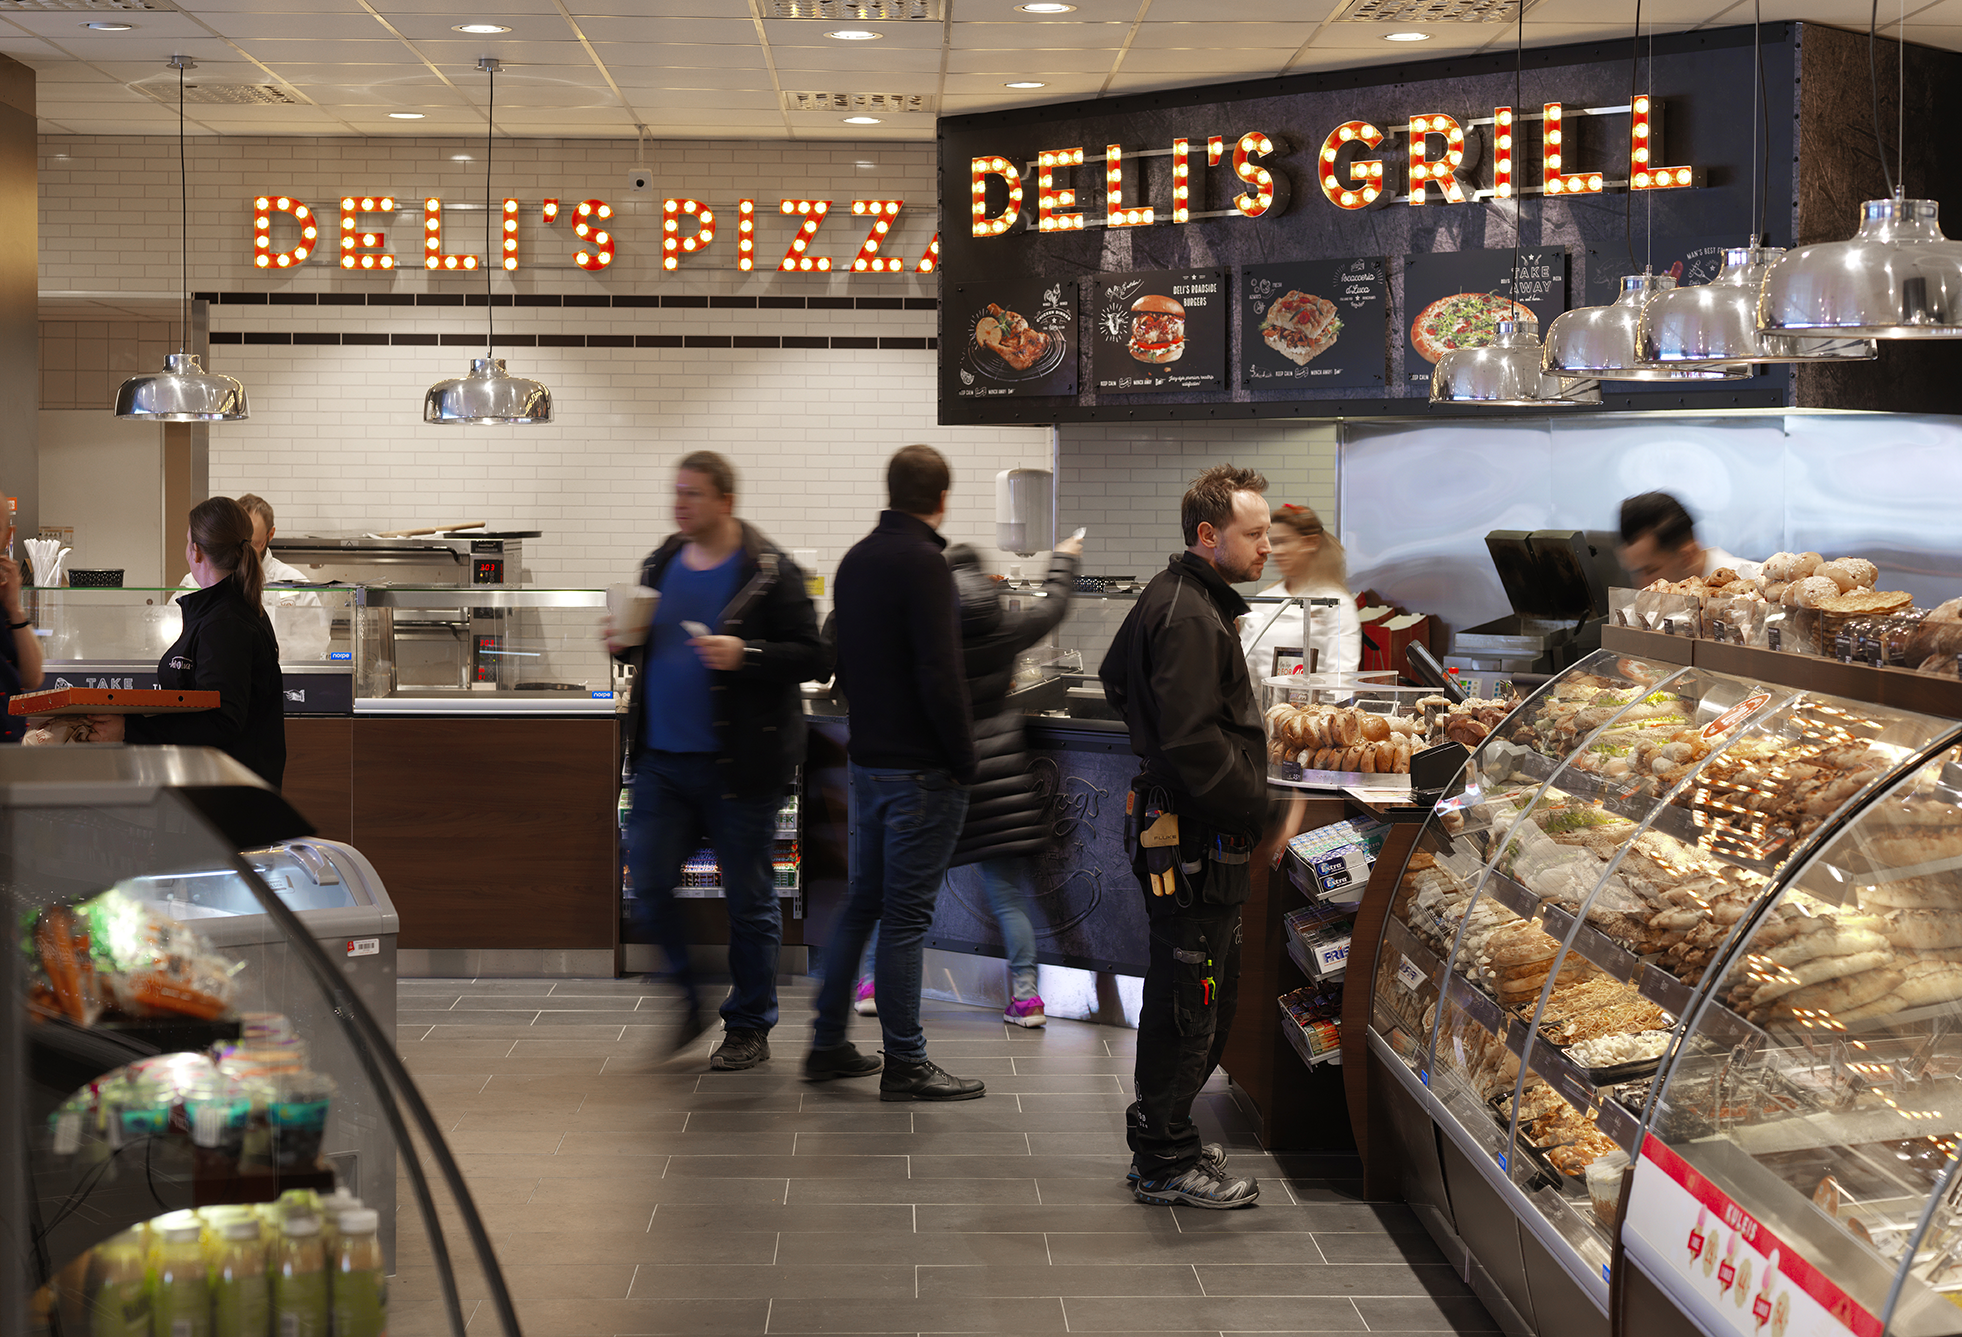 DDL_Esso_Delis_Grill.png